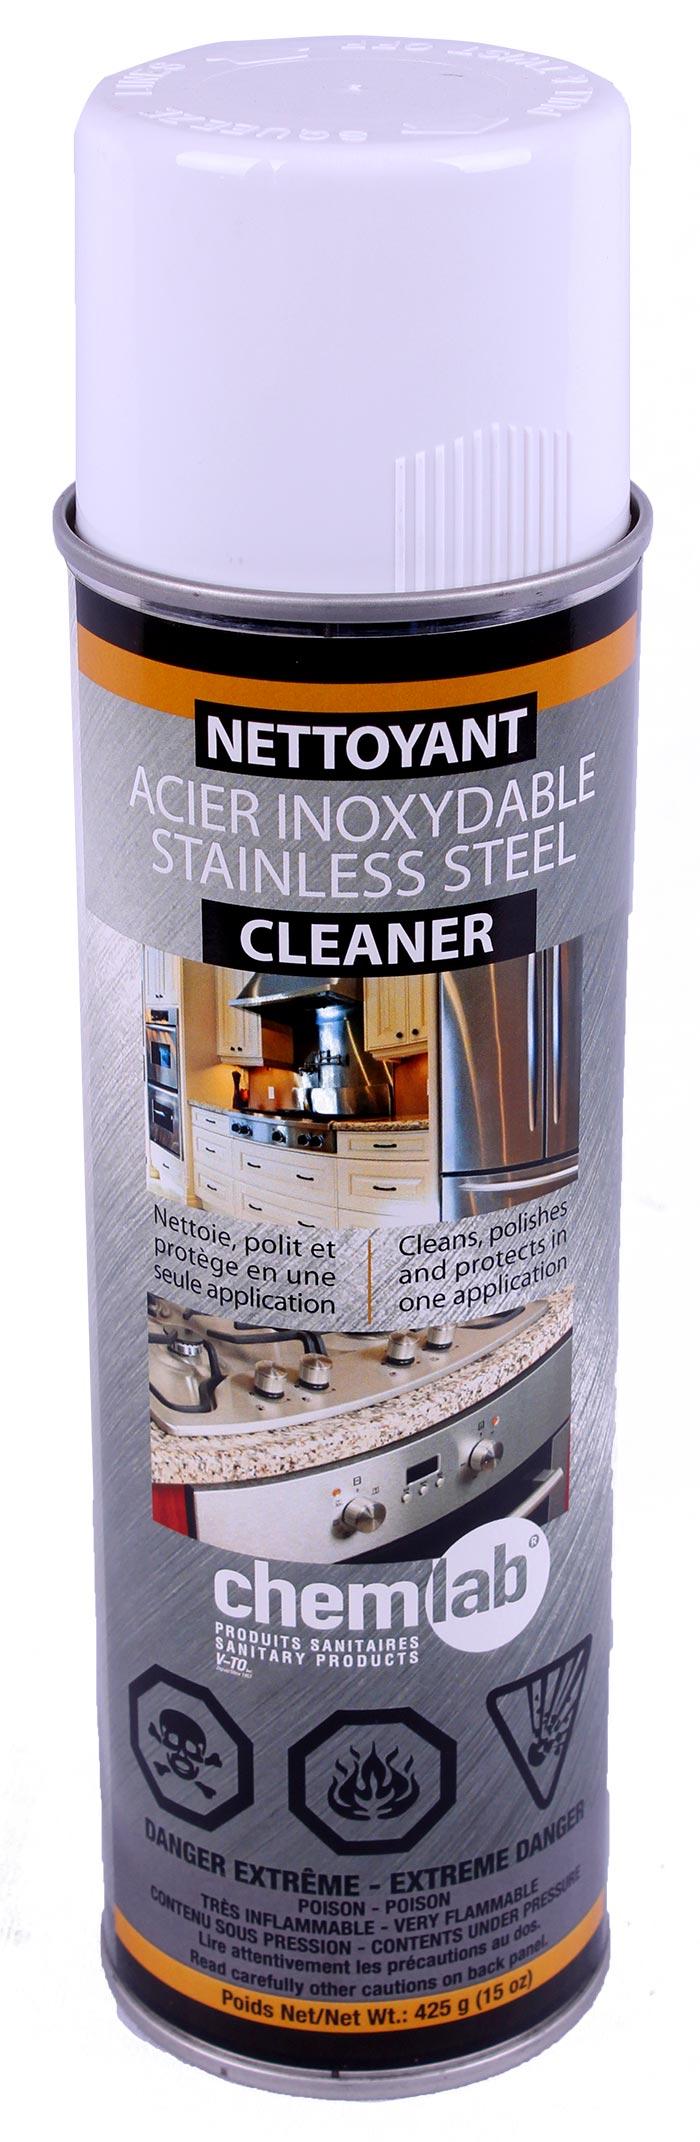 Aérosol – Nettoyant acier inoxydable